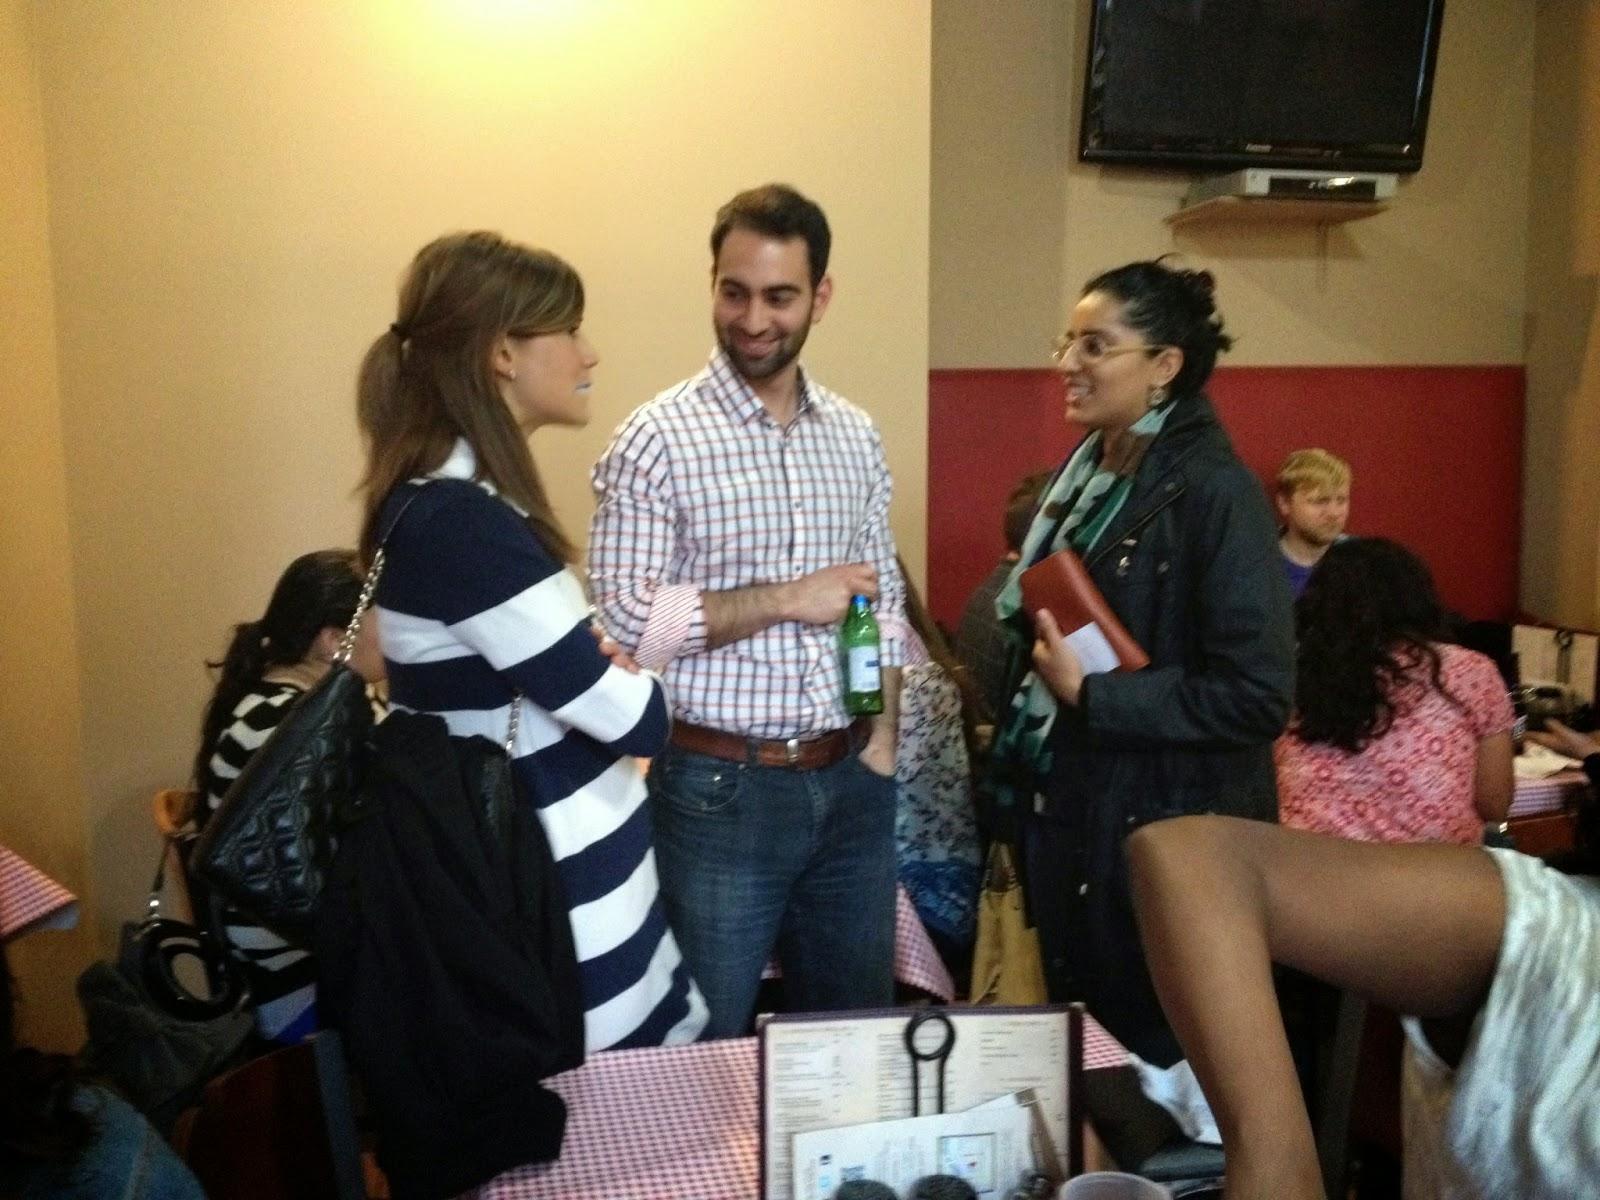 +Kathryn Pisco +Unearth the World +Pendar Khosravi +Sana Mahmood